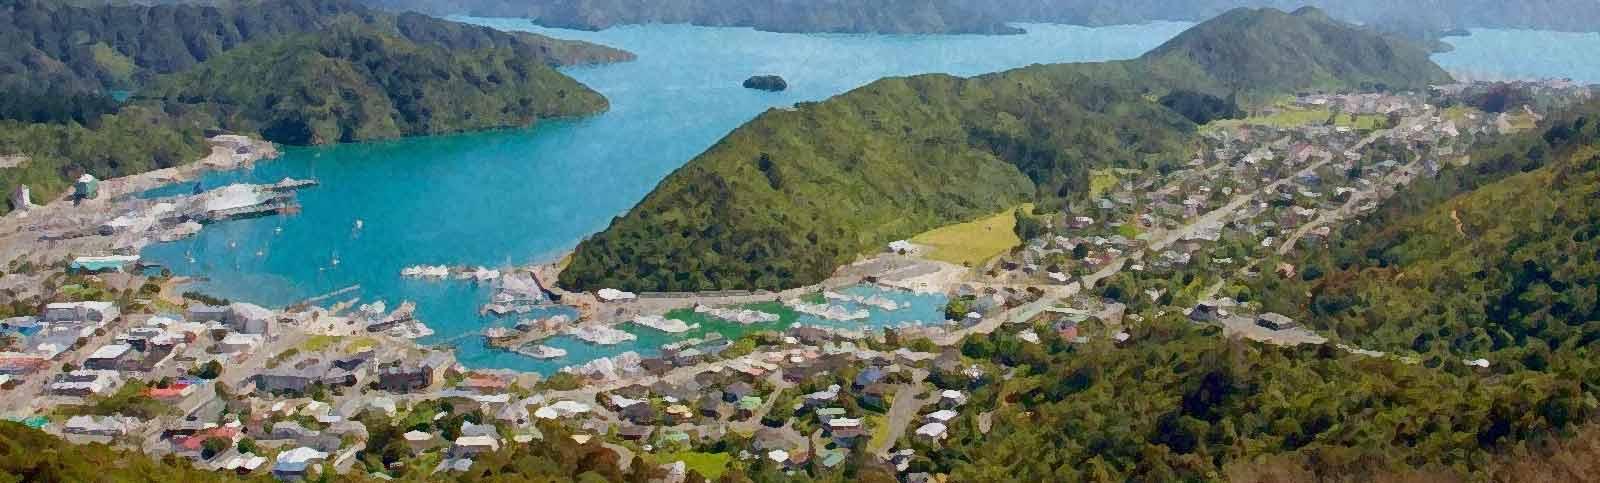 Guide to New Zealand's Marlborough Region